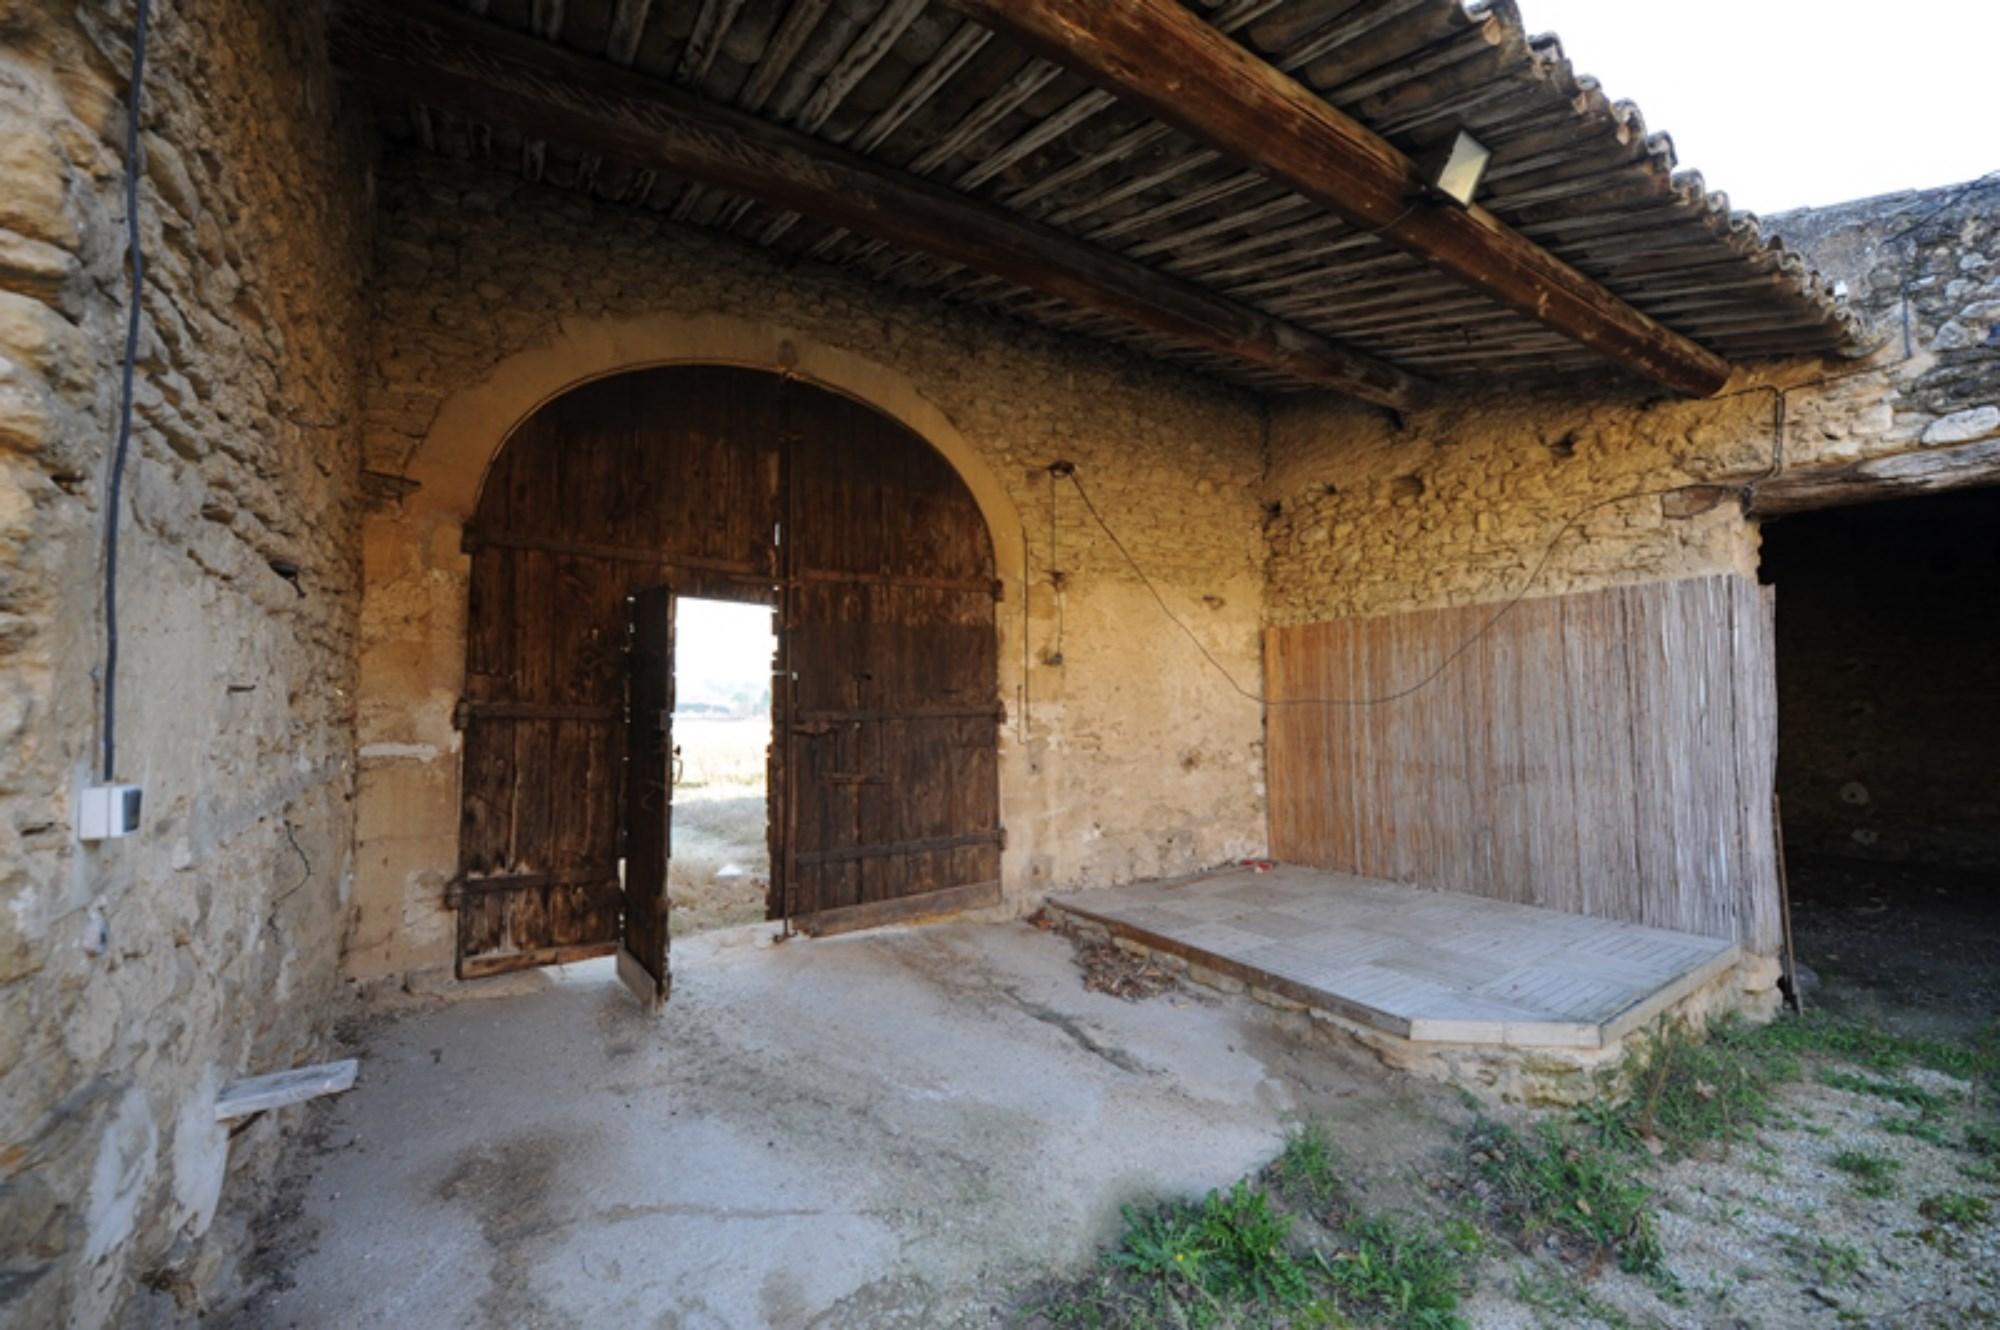 Grand mas provençal à restaurer en vente en Provence